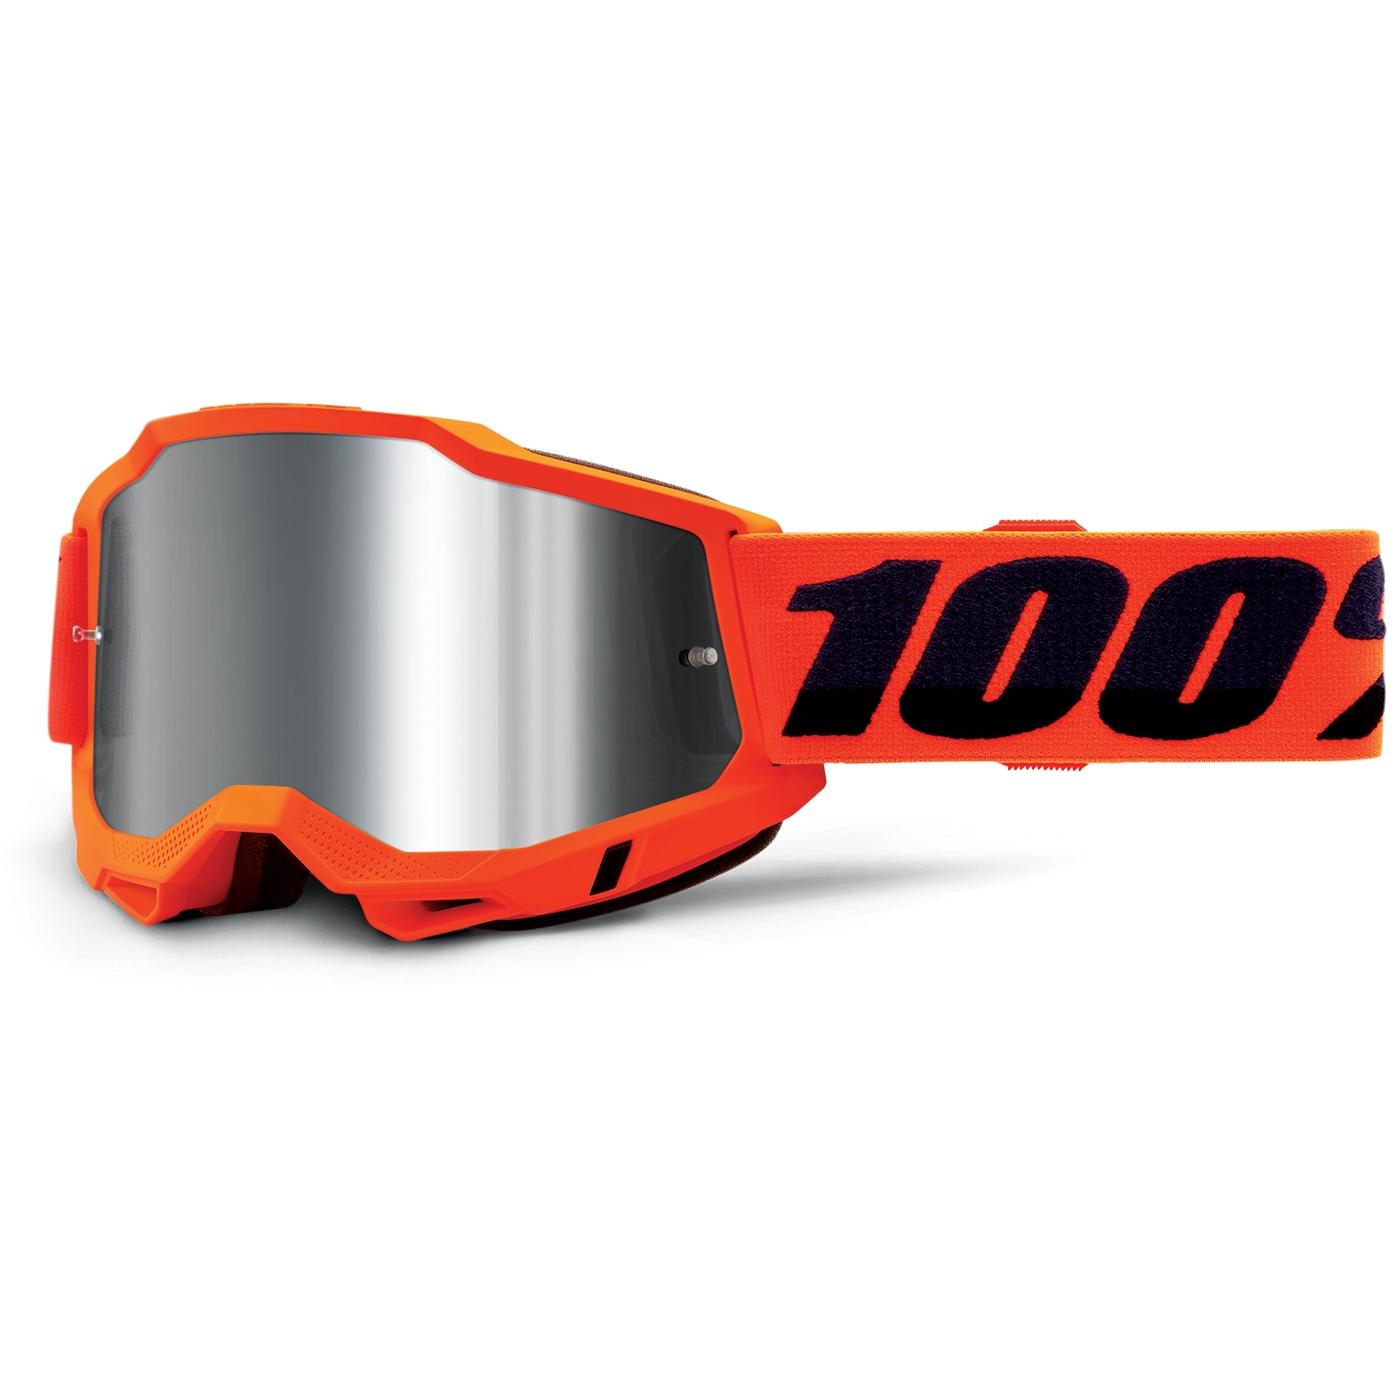 100% Accuri 2 Goggle Mirror Lens Gafas - Neon Orange